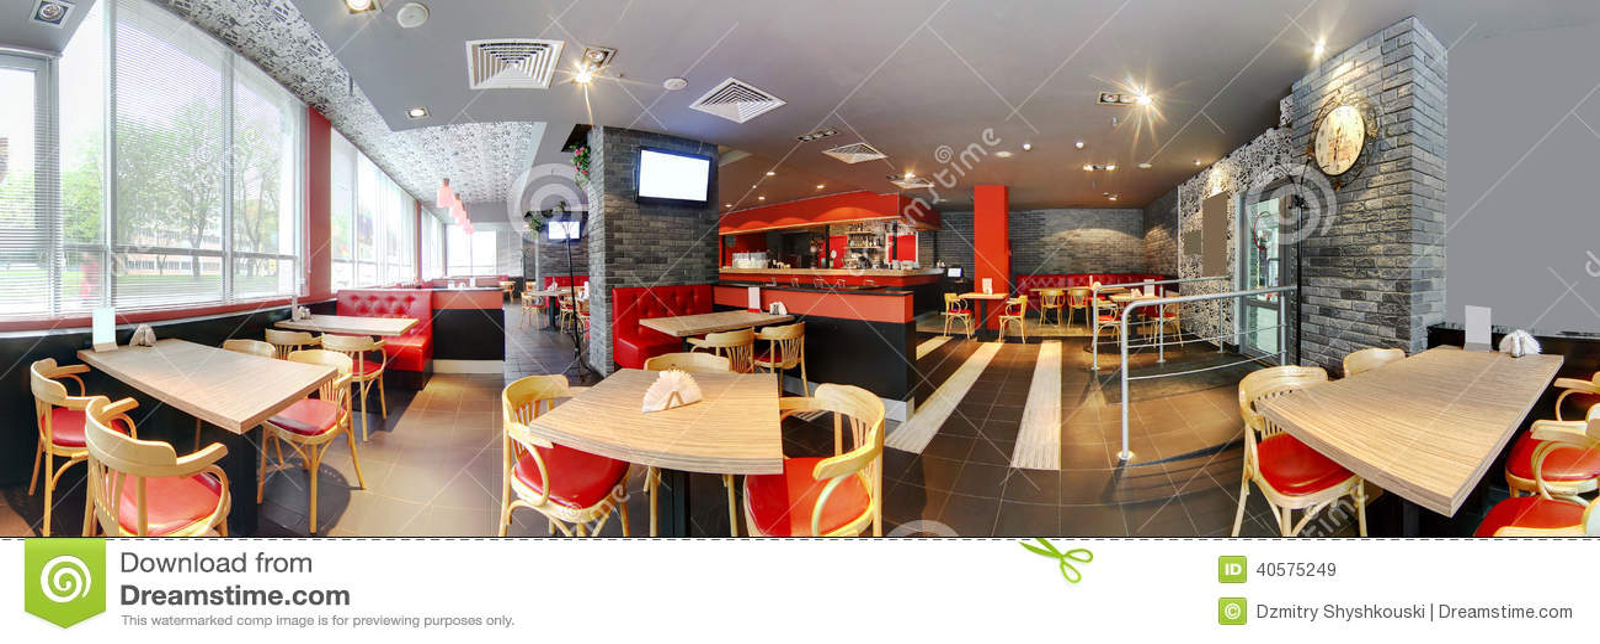 Европейский ресторан в ярких цветах